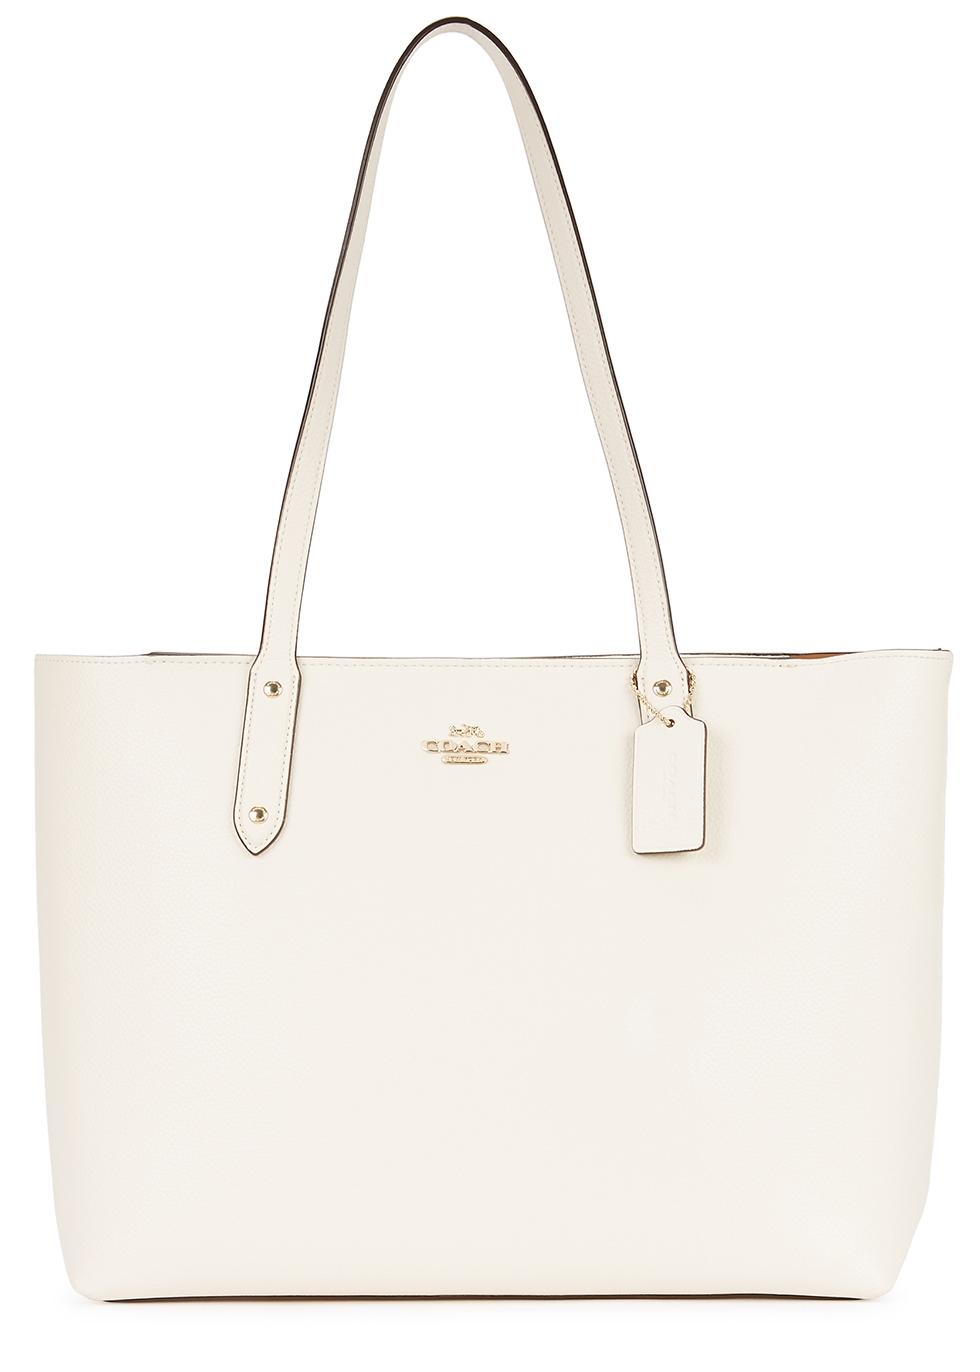 8901f5494d Coach - Designer Bags, Purses & Jewellery - Harvey Nichols